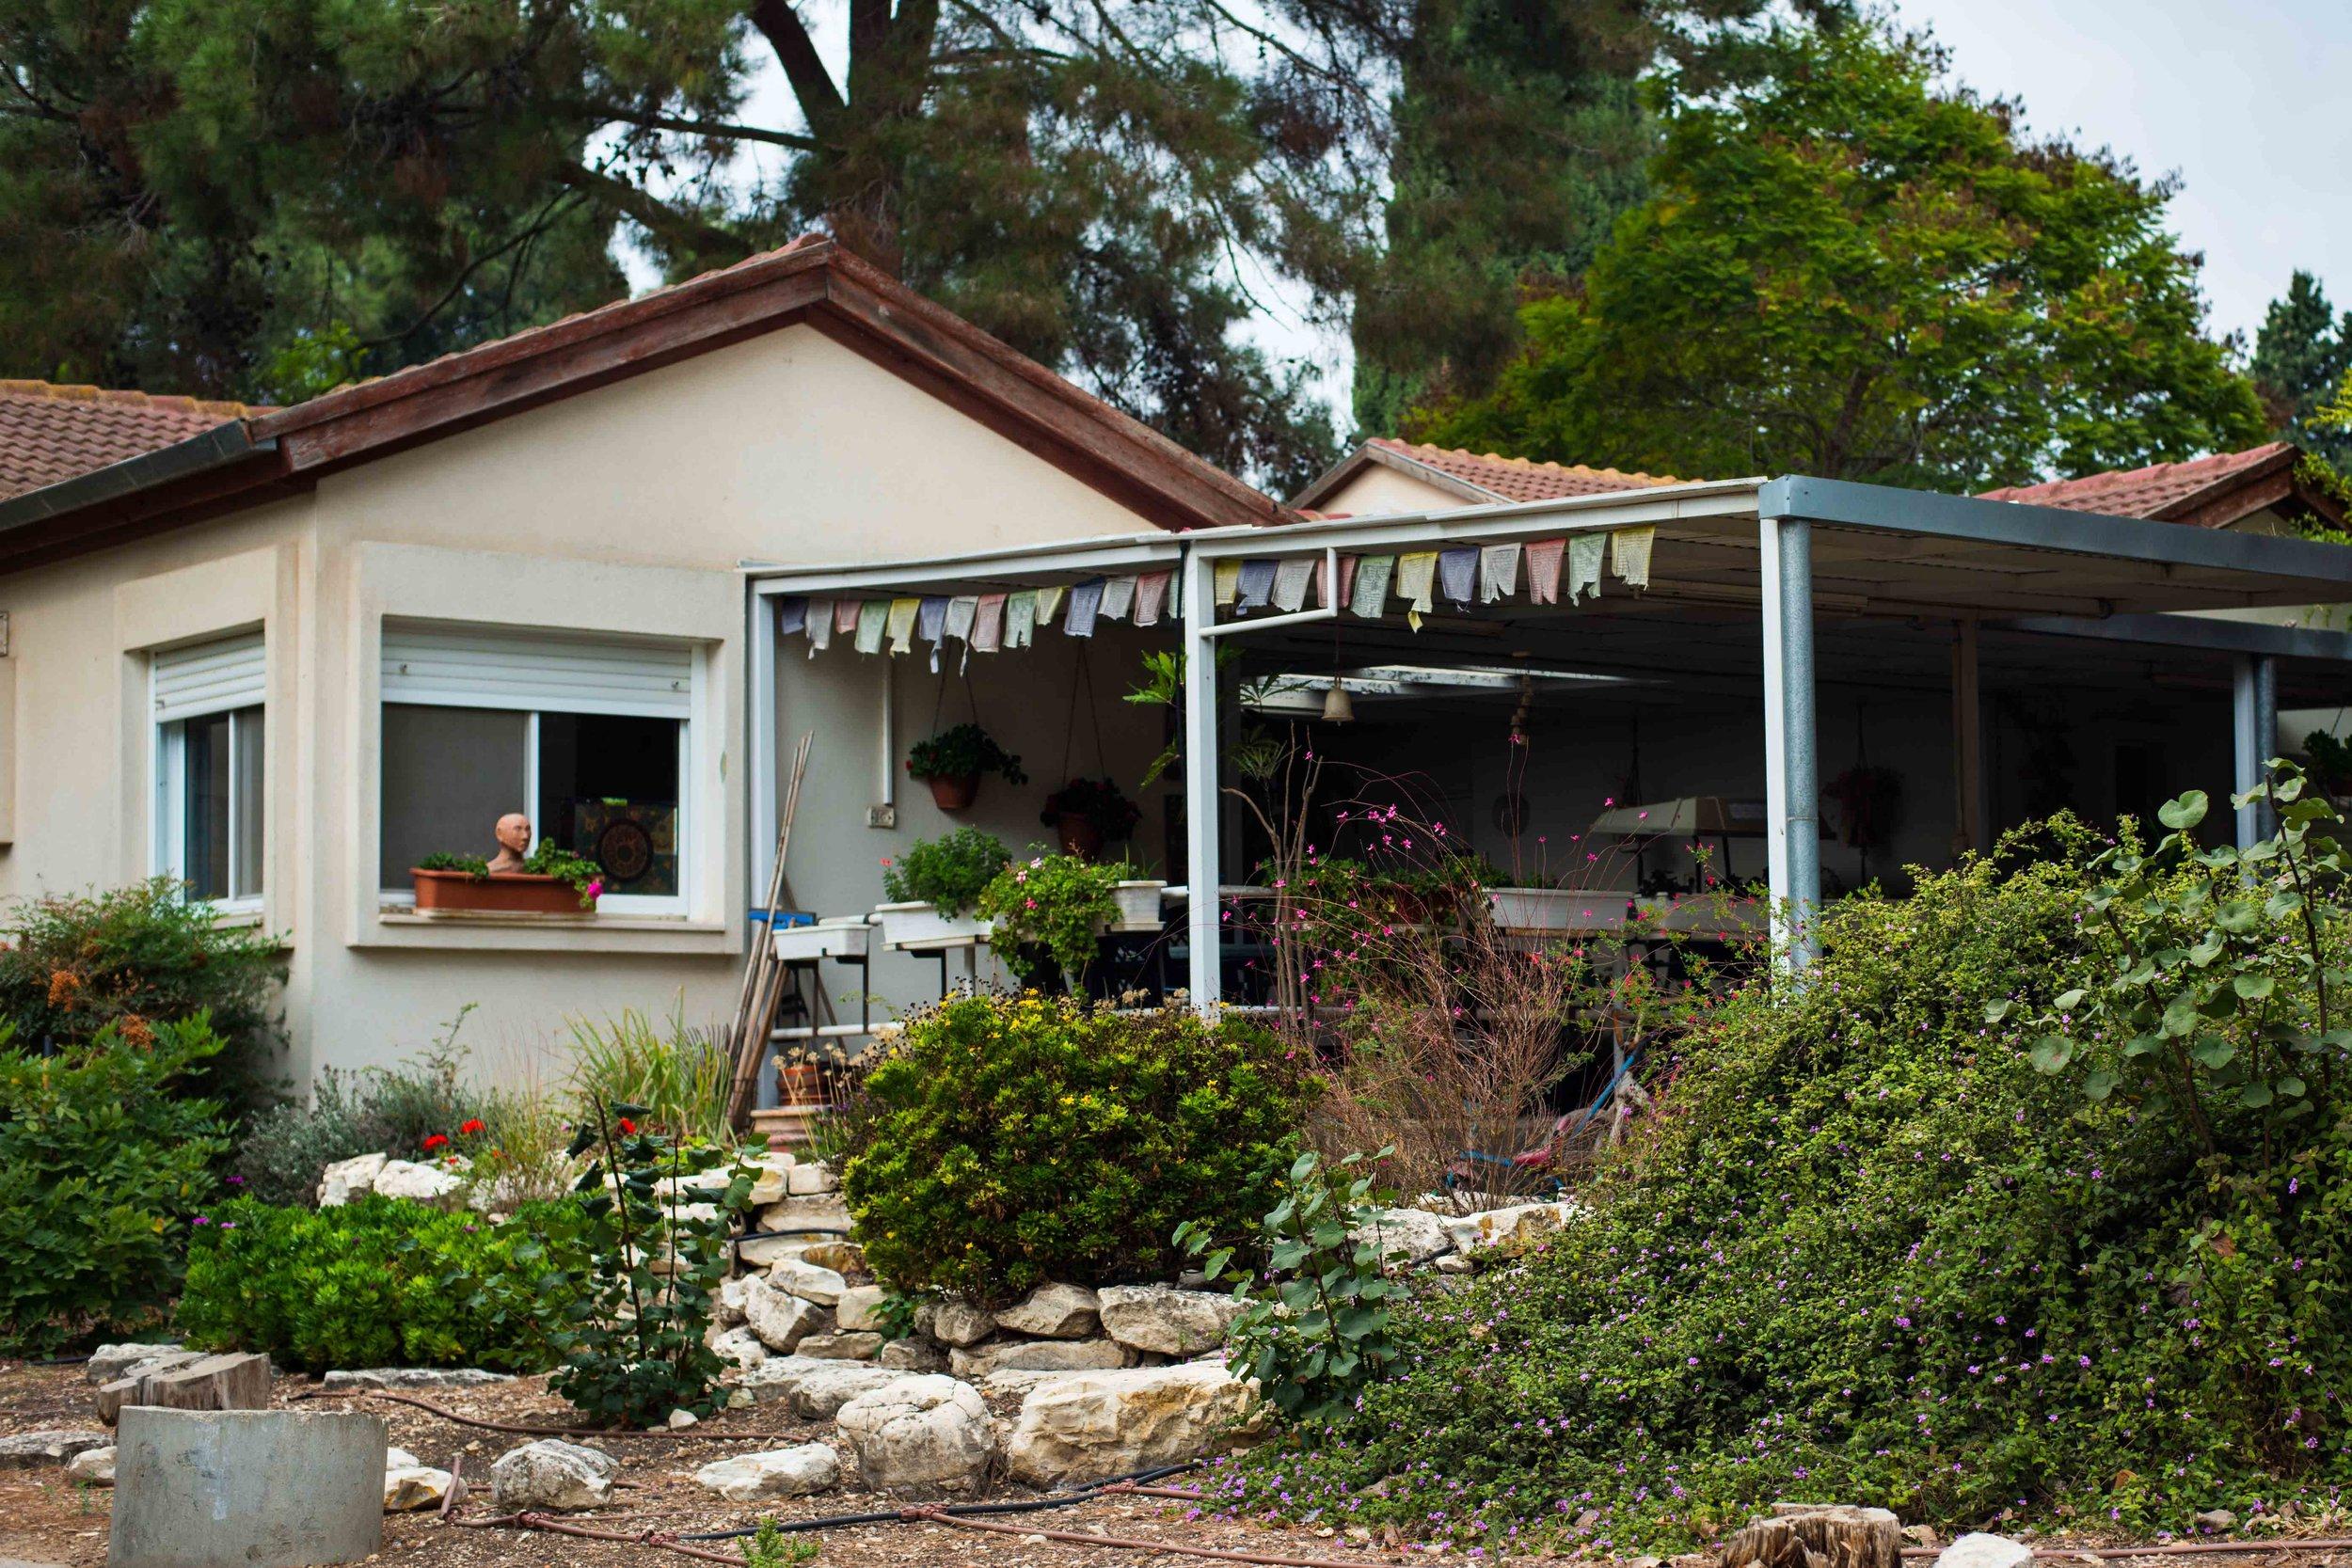 A home in Ein-HaShofet, Israel